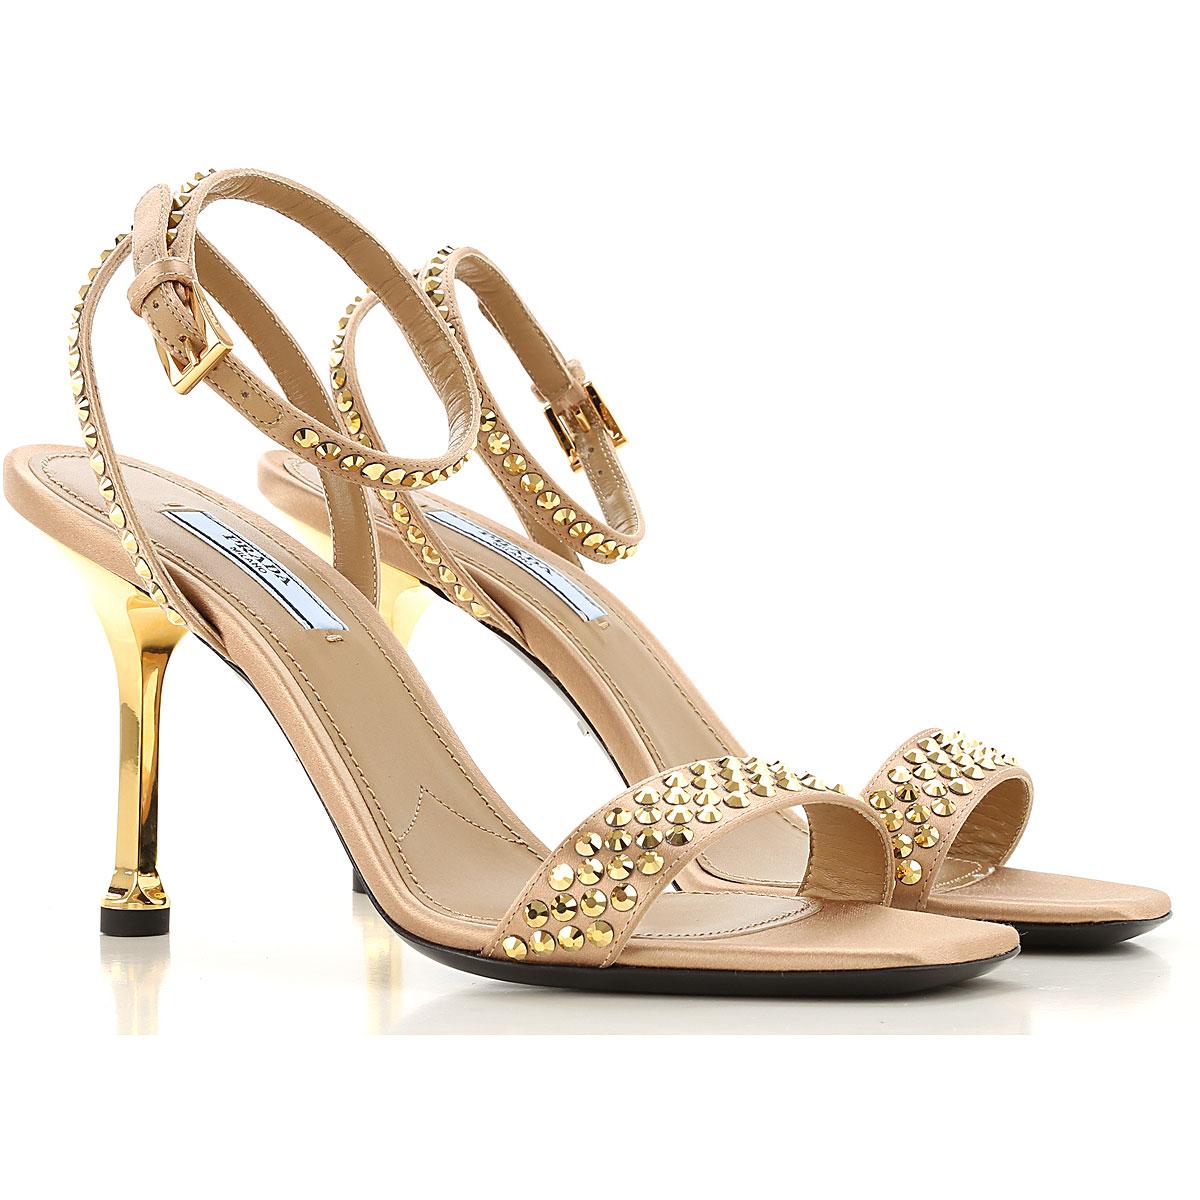 prada sandals for women on sale, skin, leather, 2019, 3 3.5 4.5 5.5 6 6.5 7.5